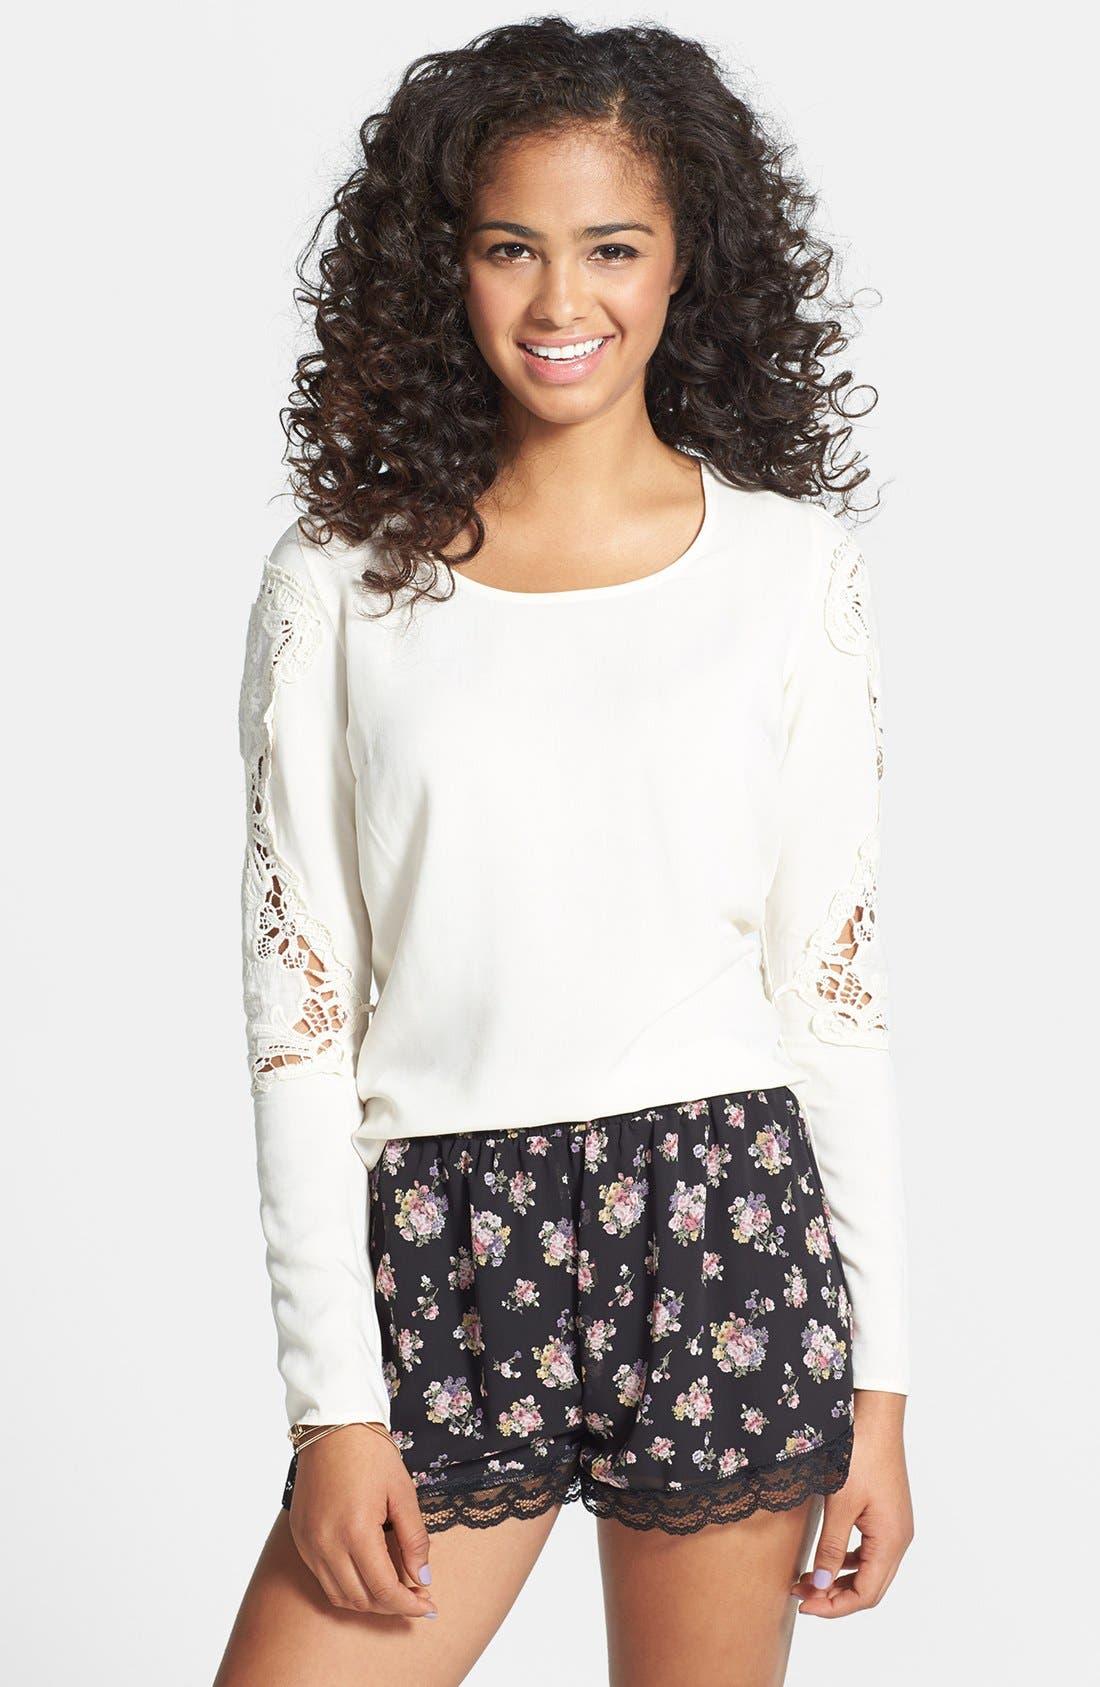 Alternate Image 1 Selected - Painted Threads Crochet Sleeve Envelope Back Tee (Juniors) (Online Only)